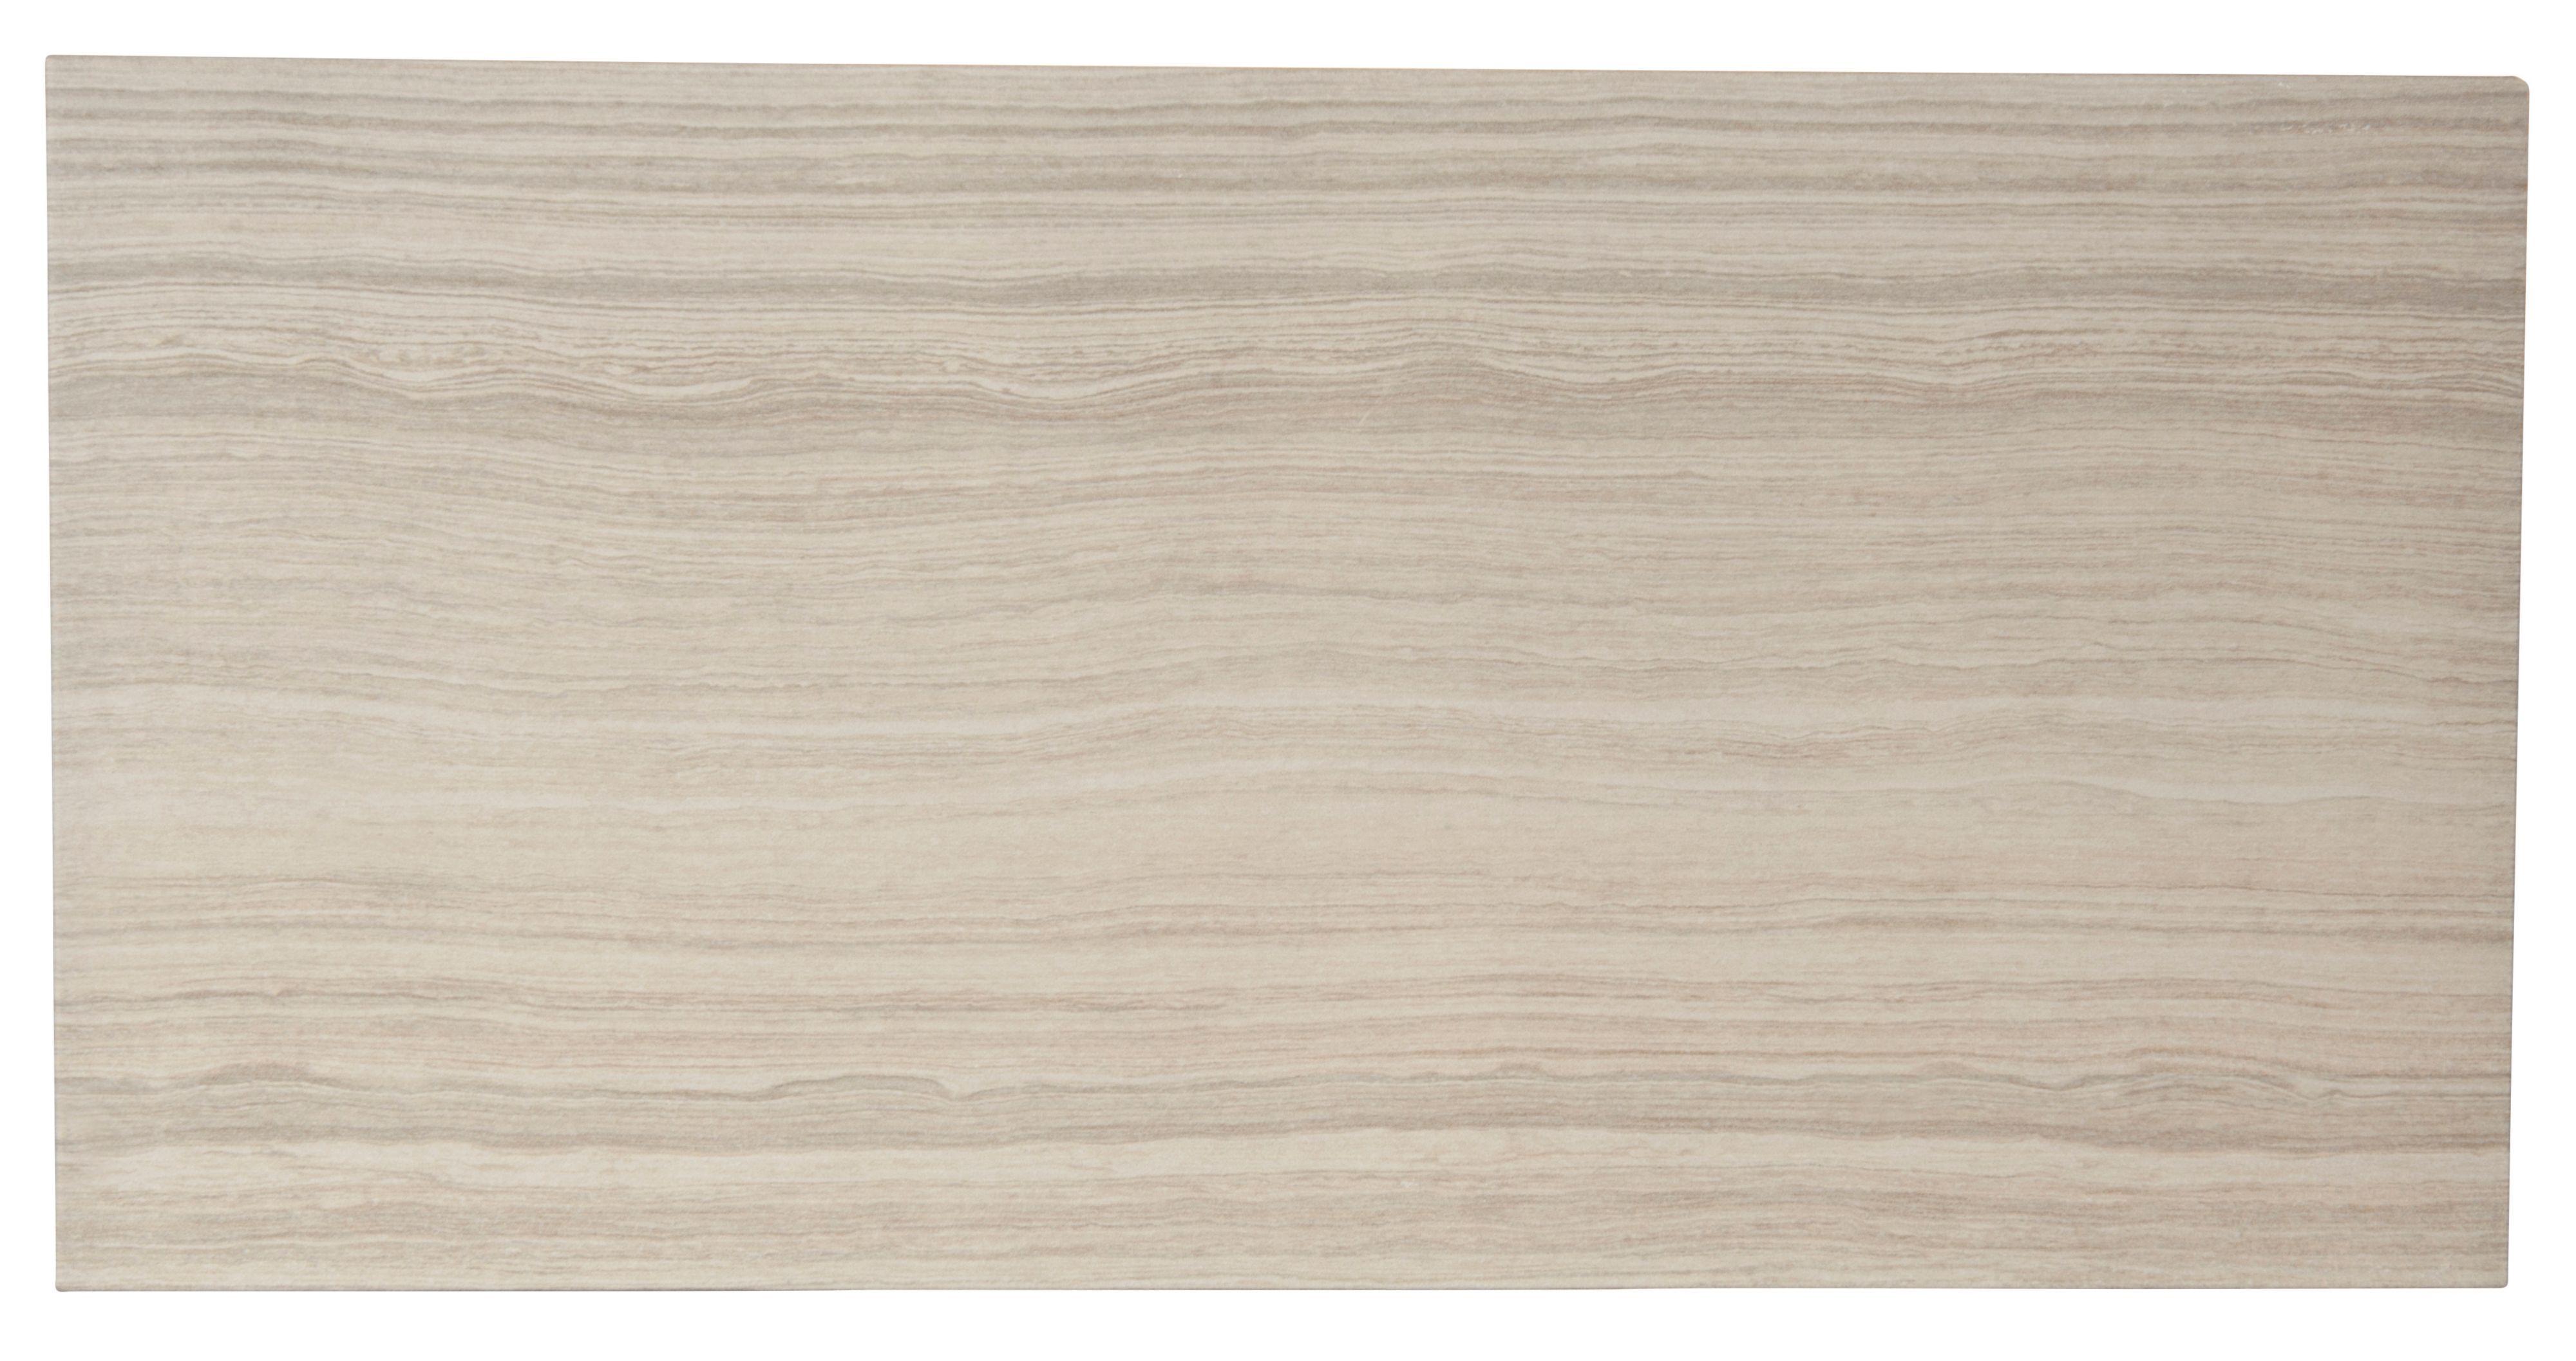 bolina bone ceramic wall & floor tile, pack of 6, (l)600mm (w